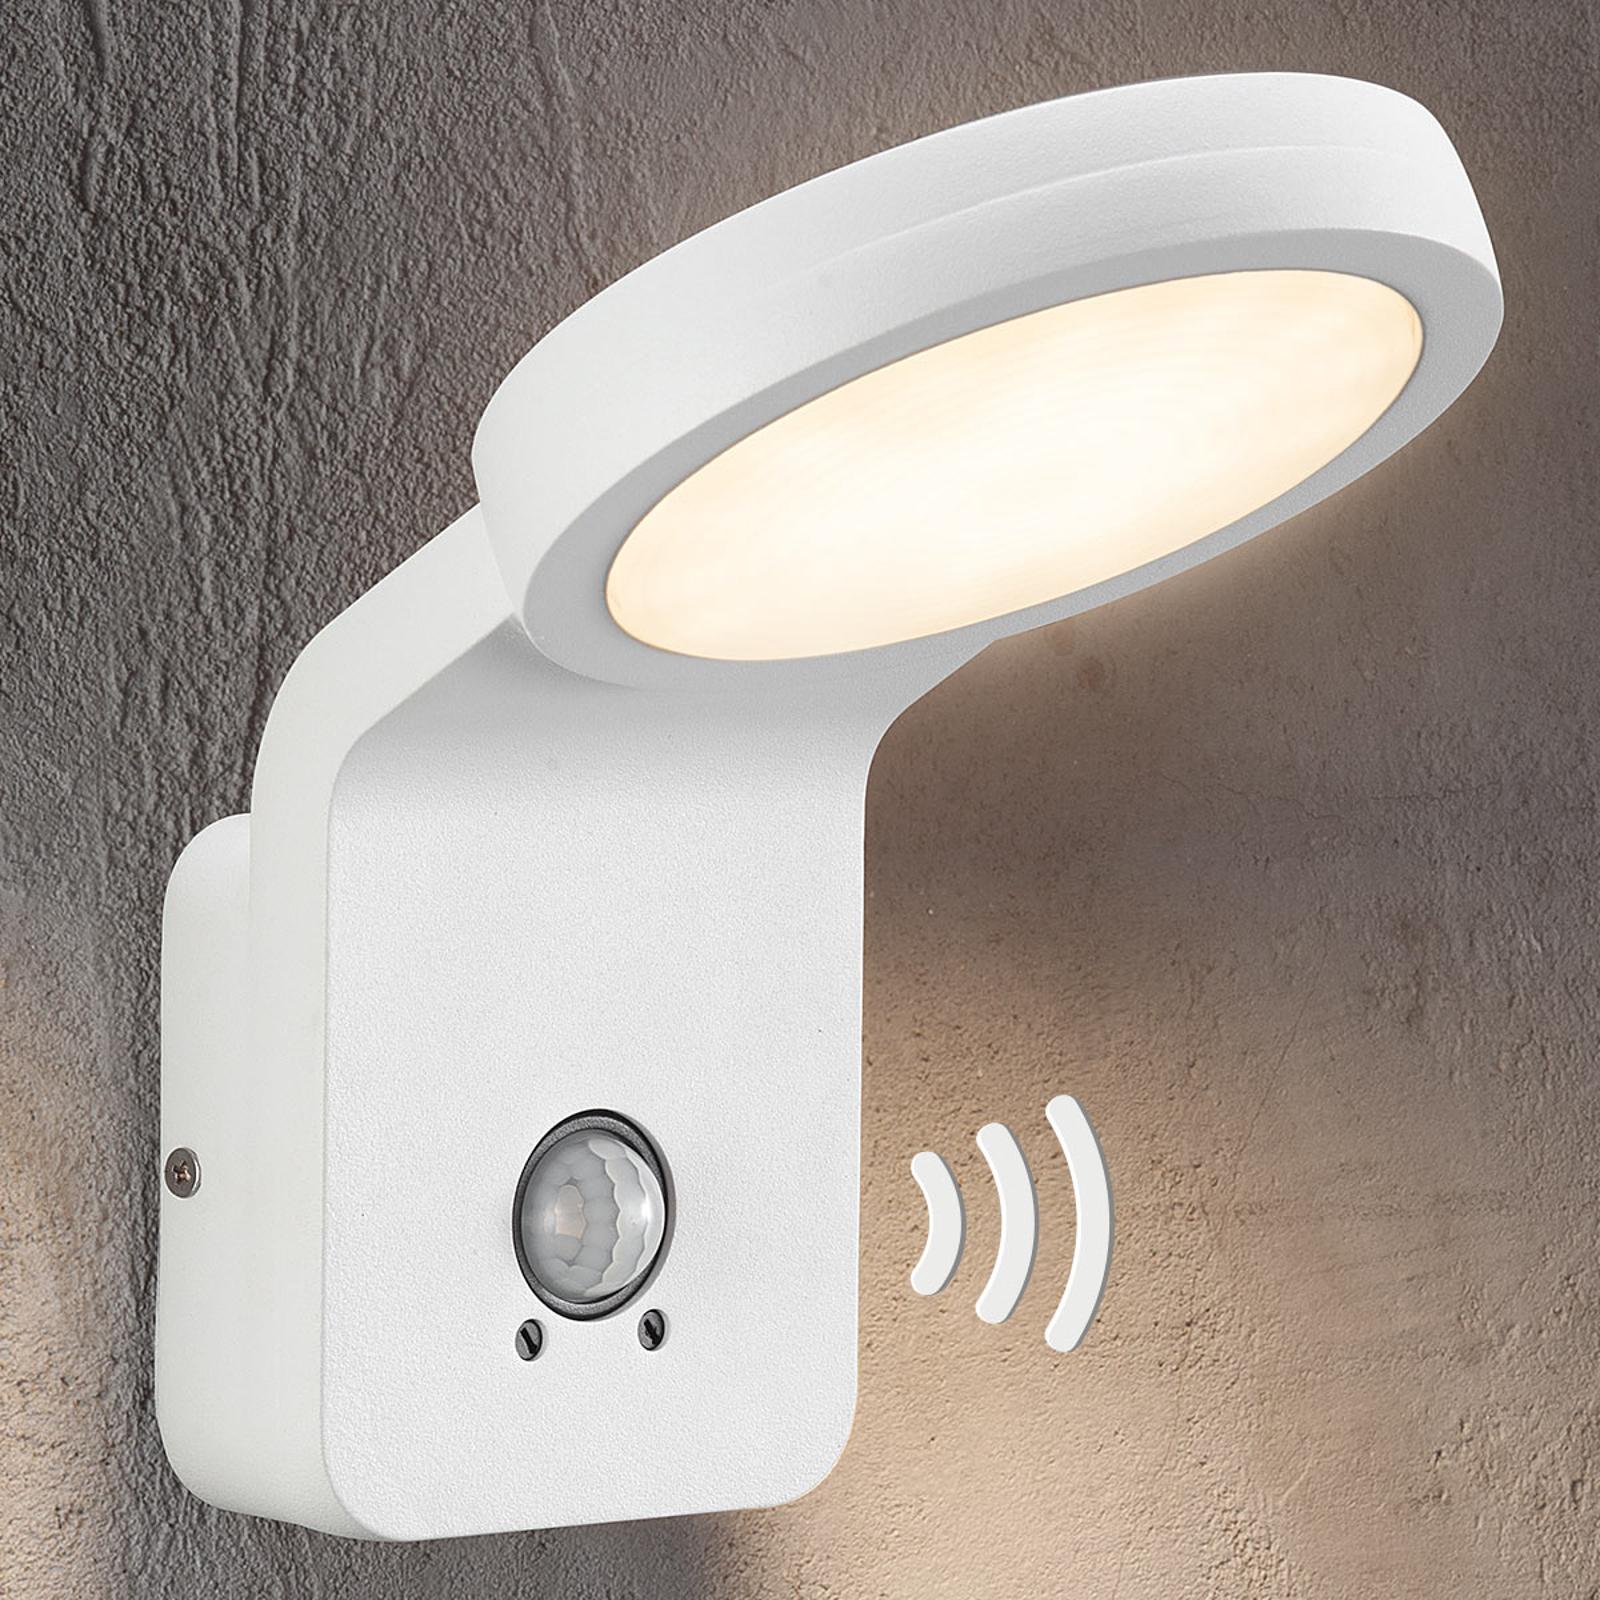 LED-Außenwandleuchte Marina m. IR-Sensor weiß